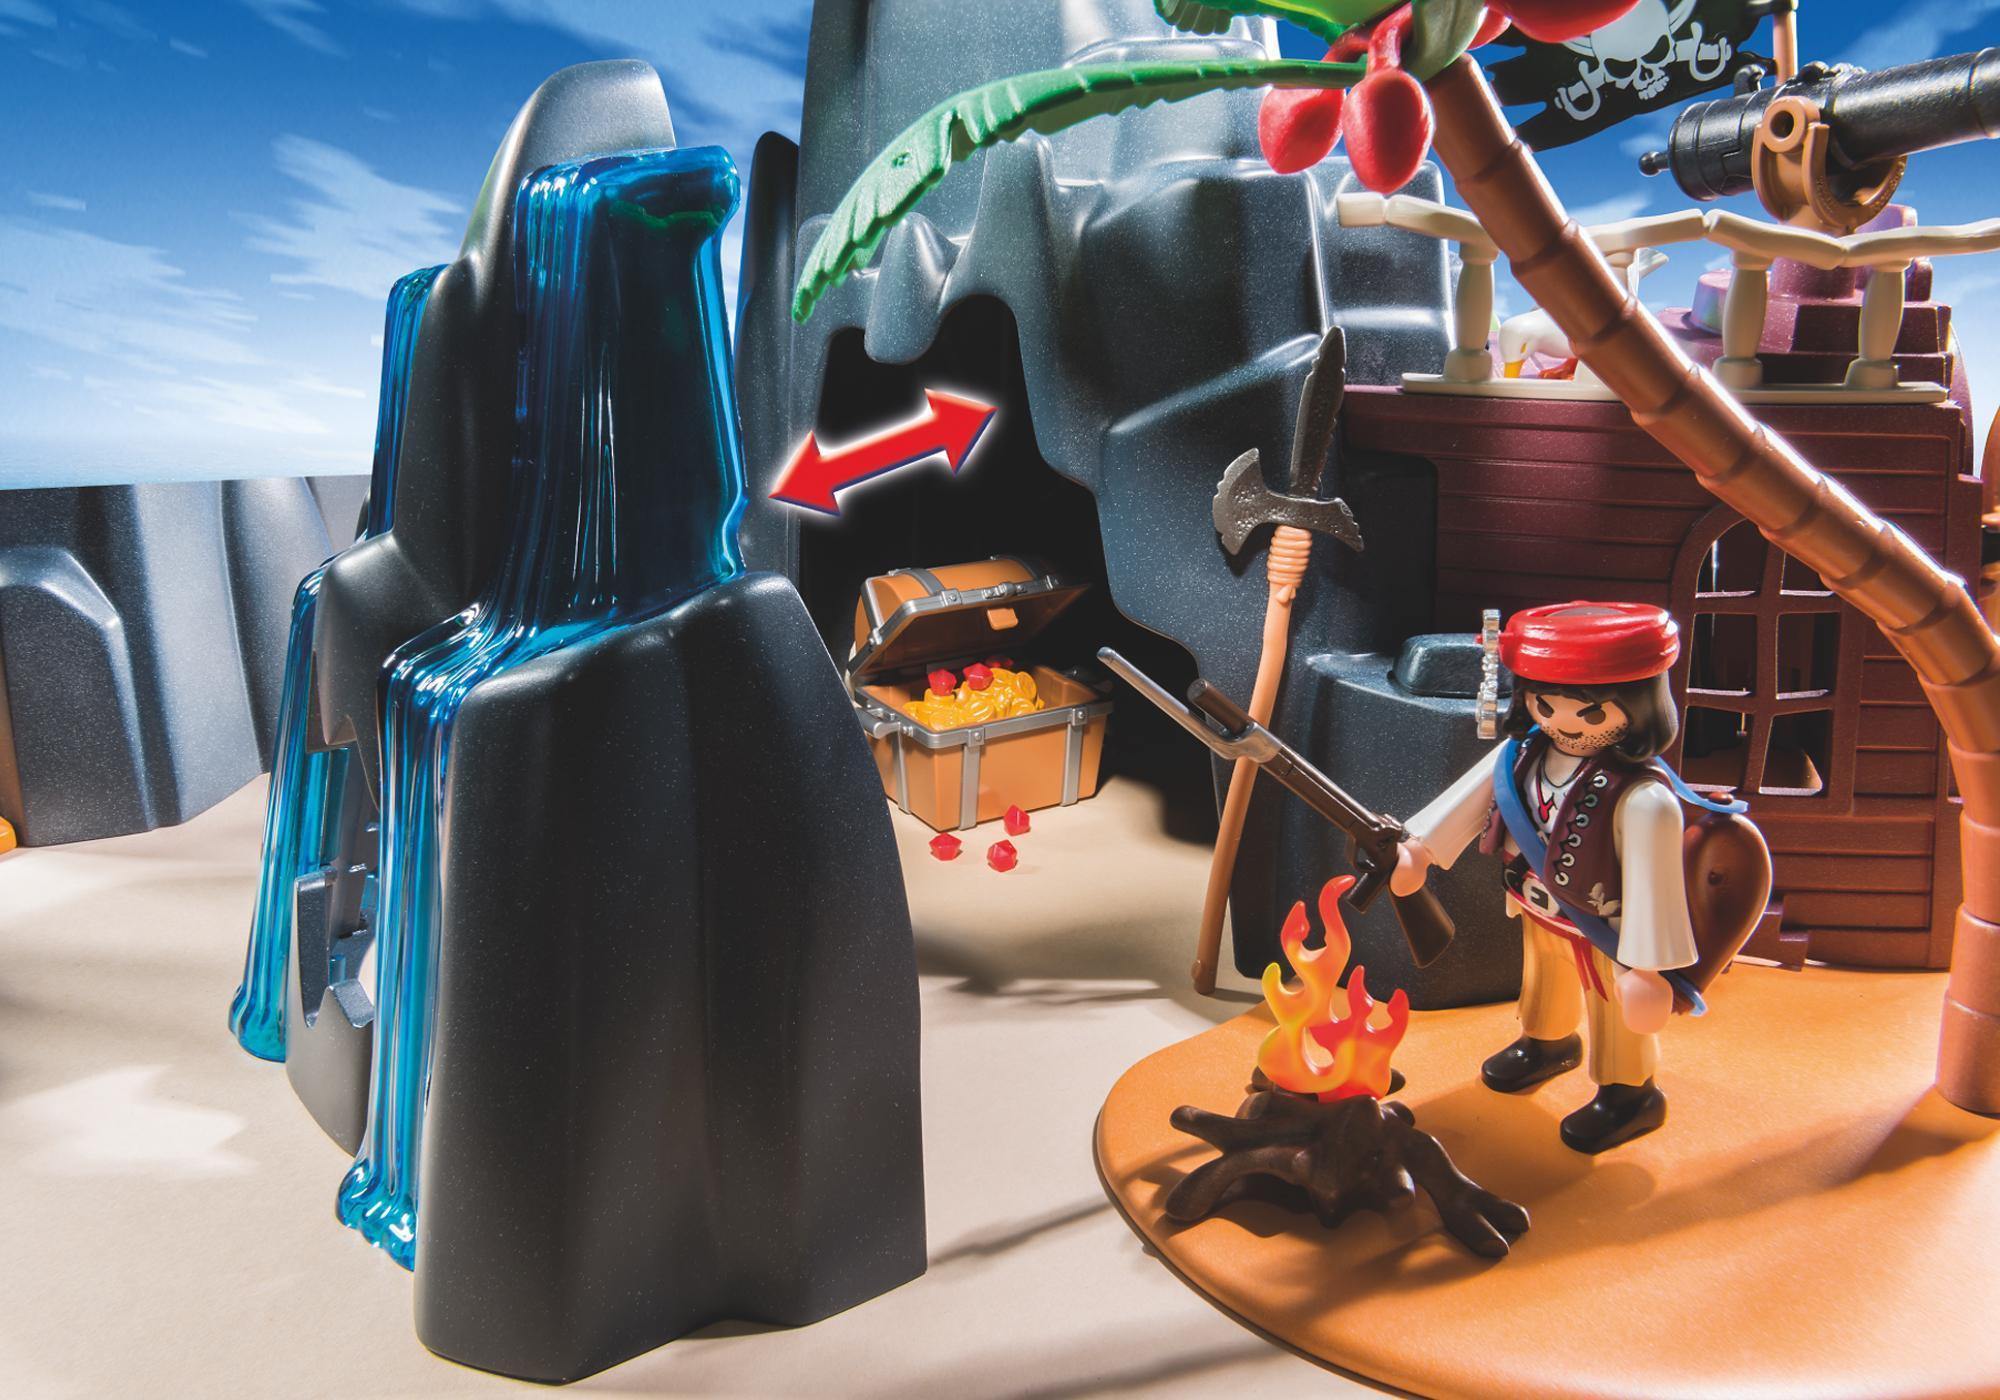 http://media.playmobil.com/i/playmobil/6679_product_extra1/Pirate Treasure Island